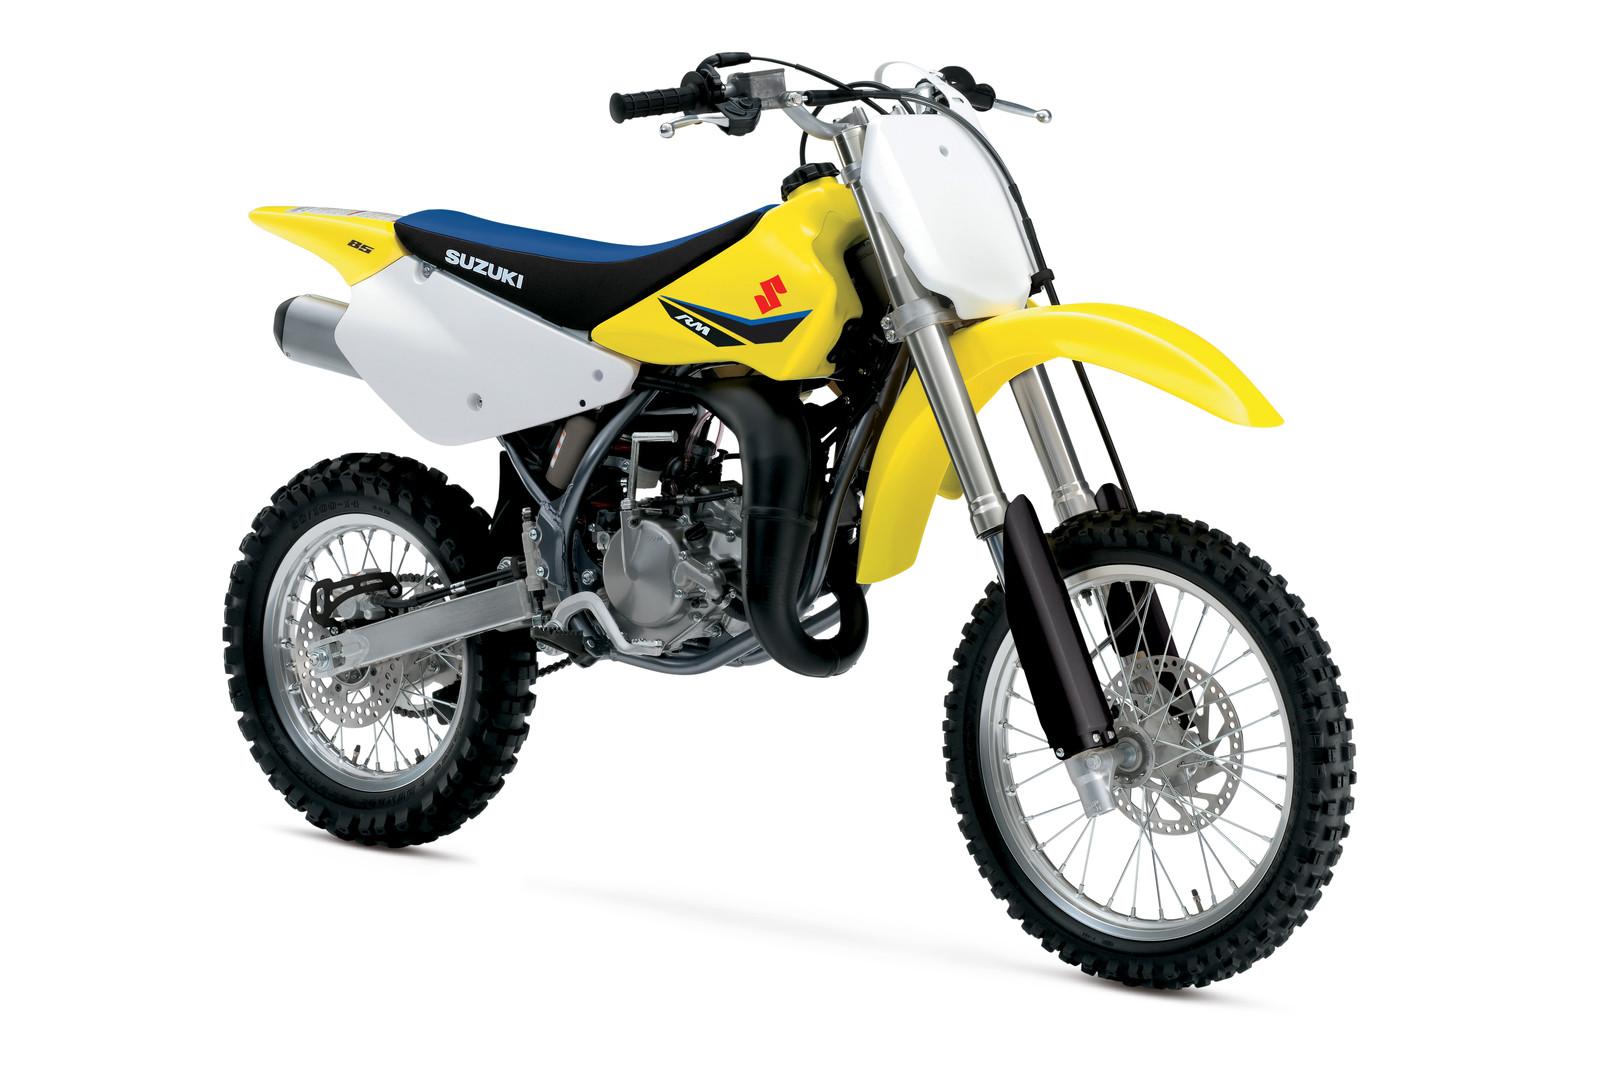 First Look: 2020 Suzuki Motocross Models